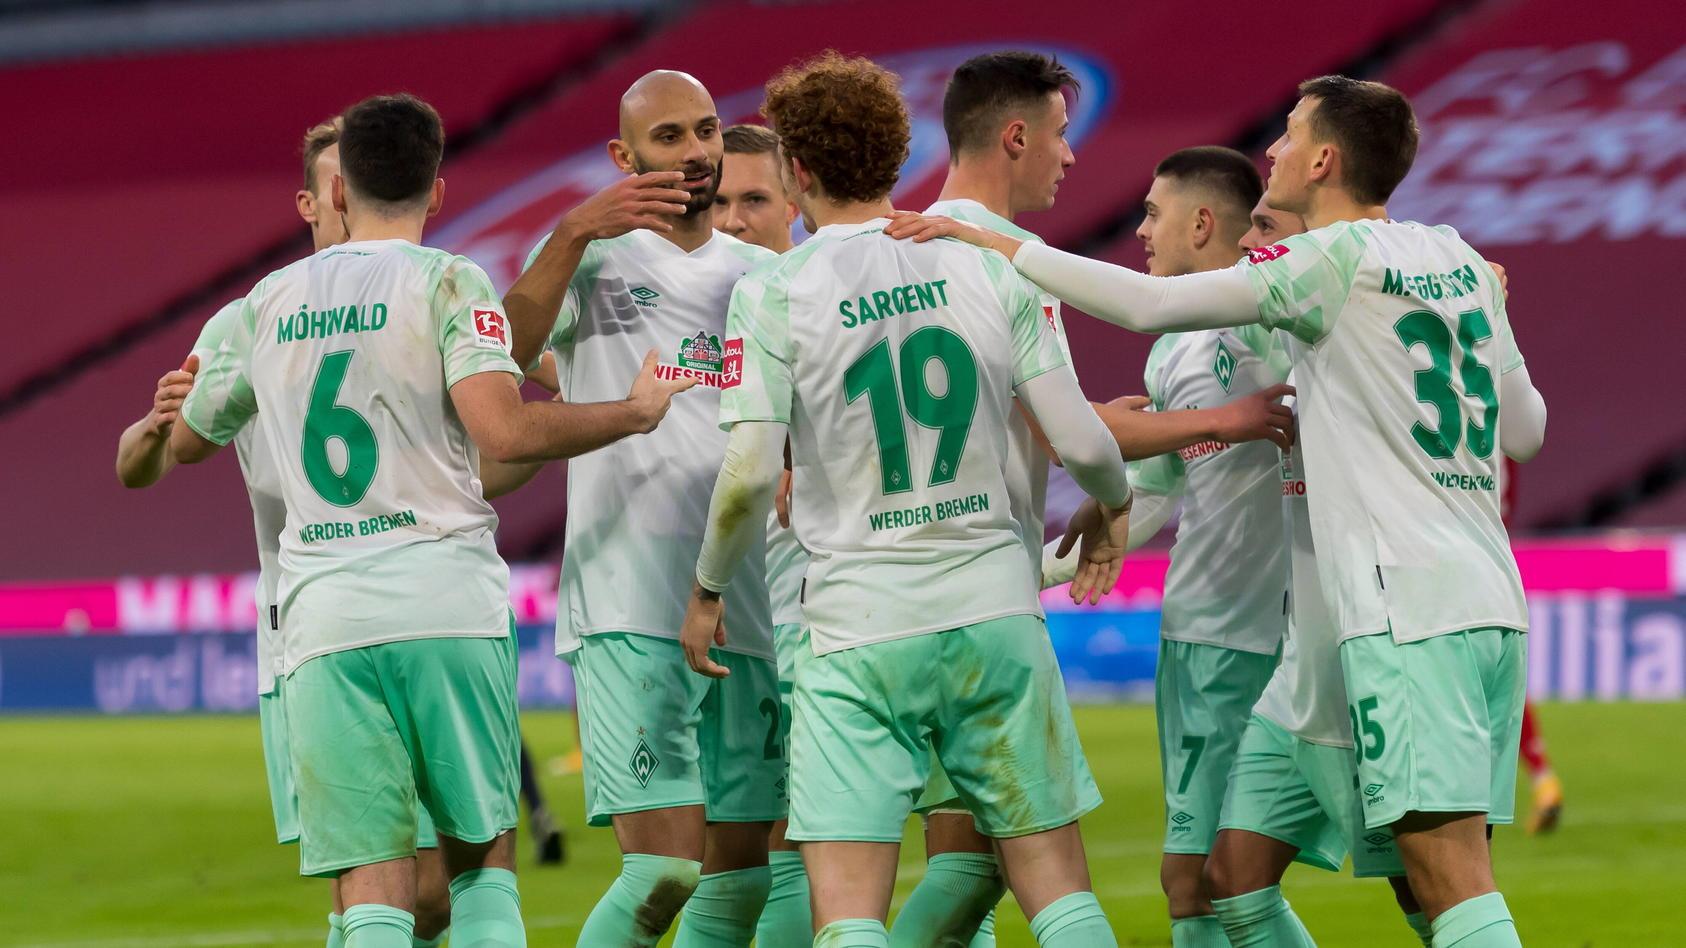 Bremen feiert den Treffer zum 1:0.